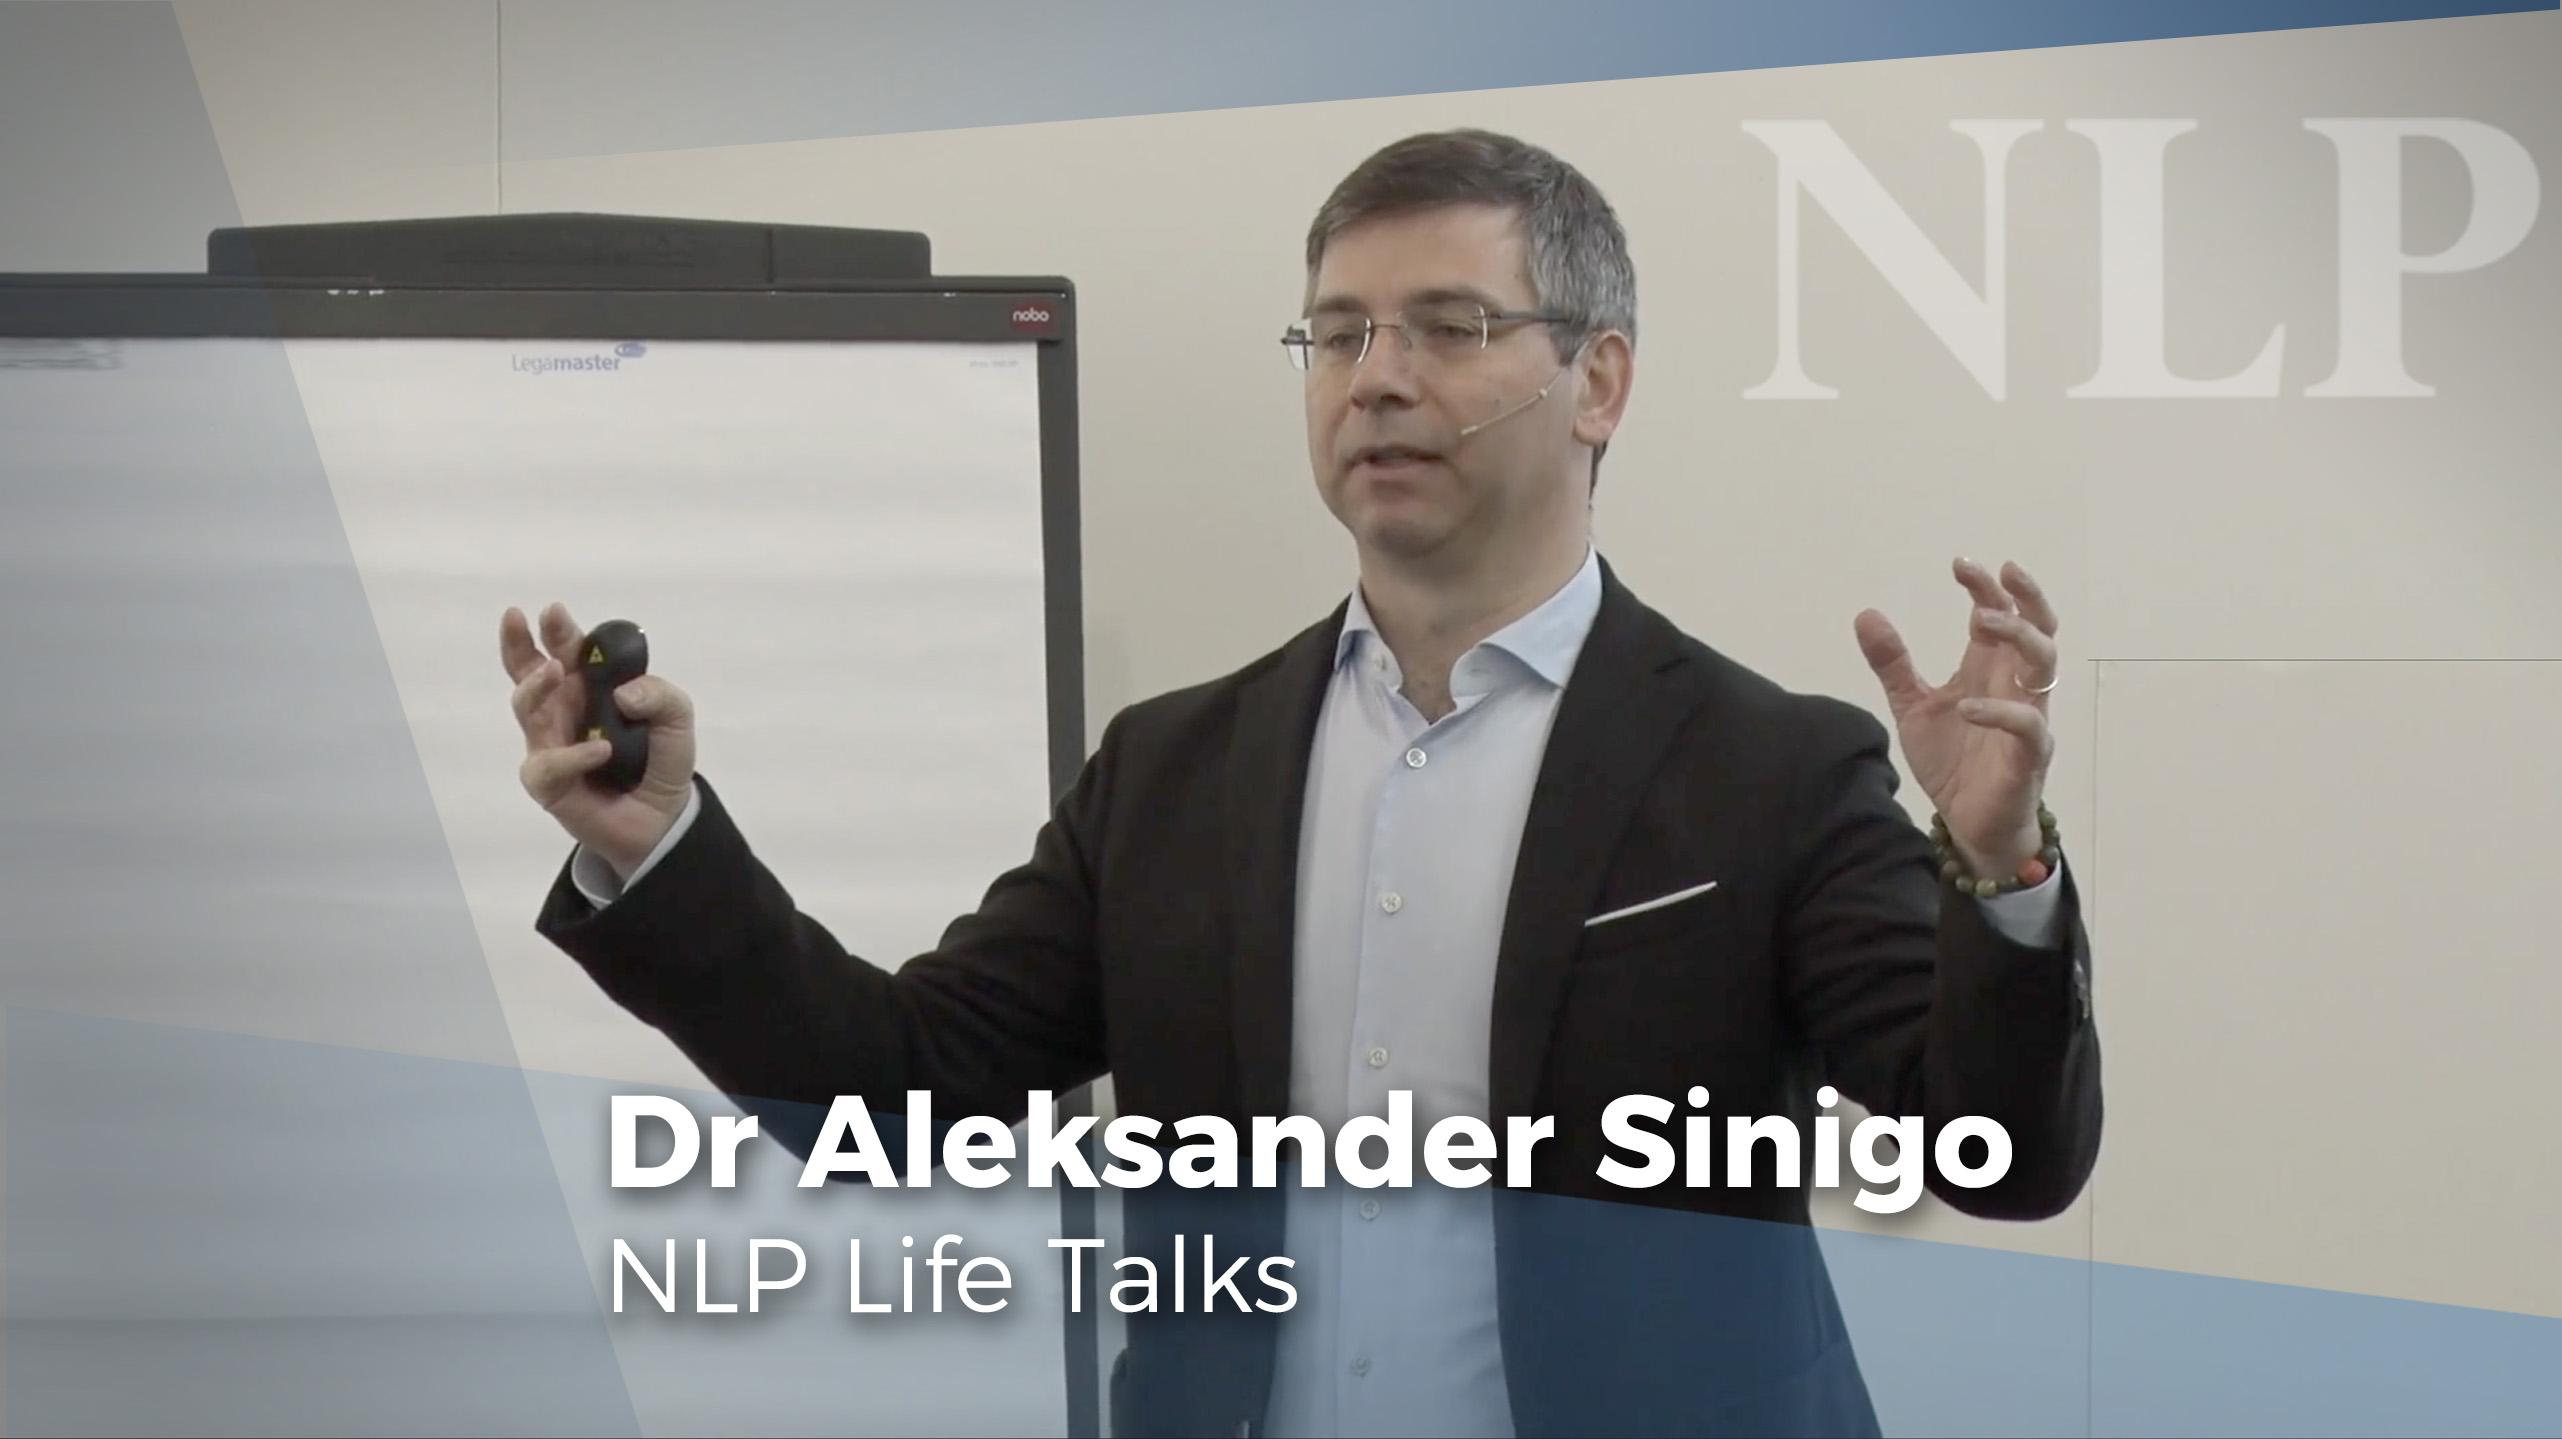 Dr Aleksander Sinigo's NLP Life Talk